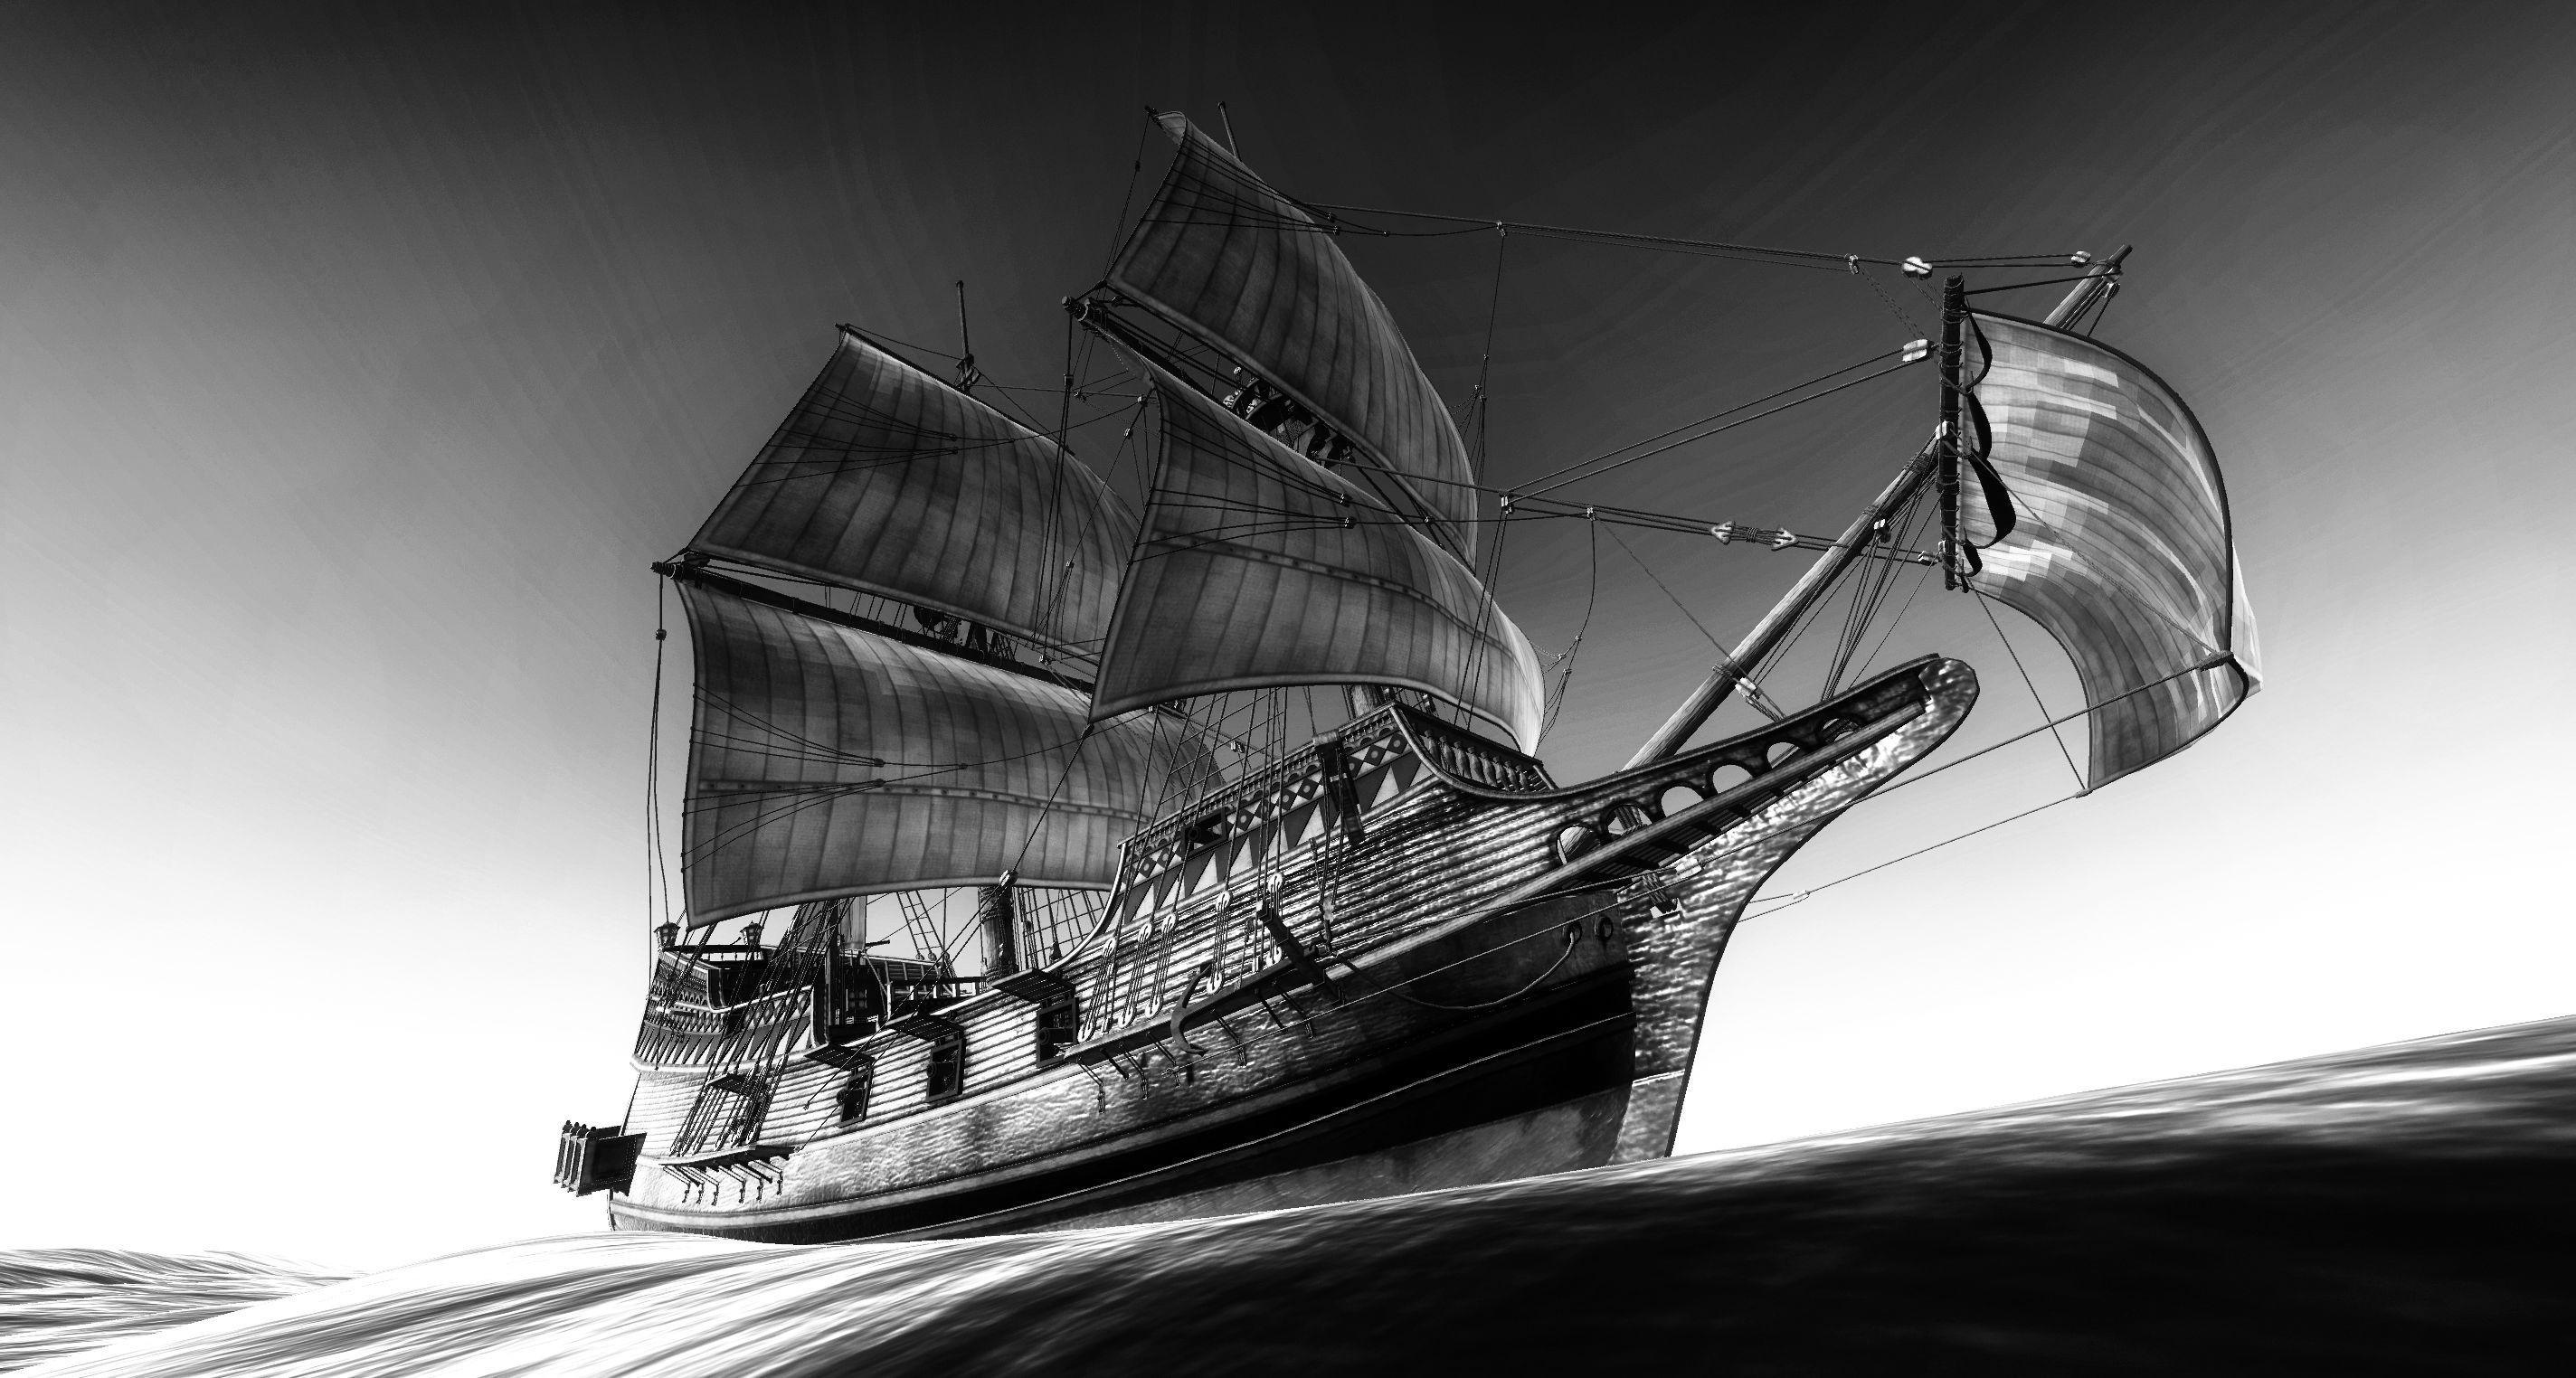 Realistic Pirate Ship